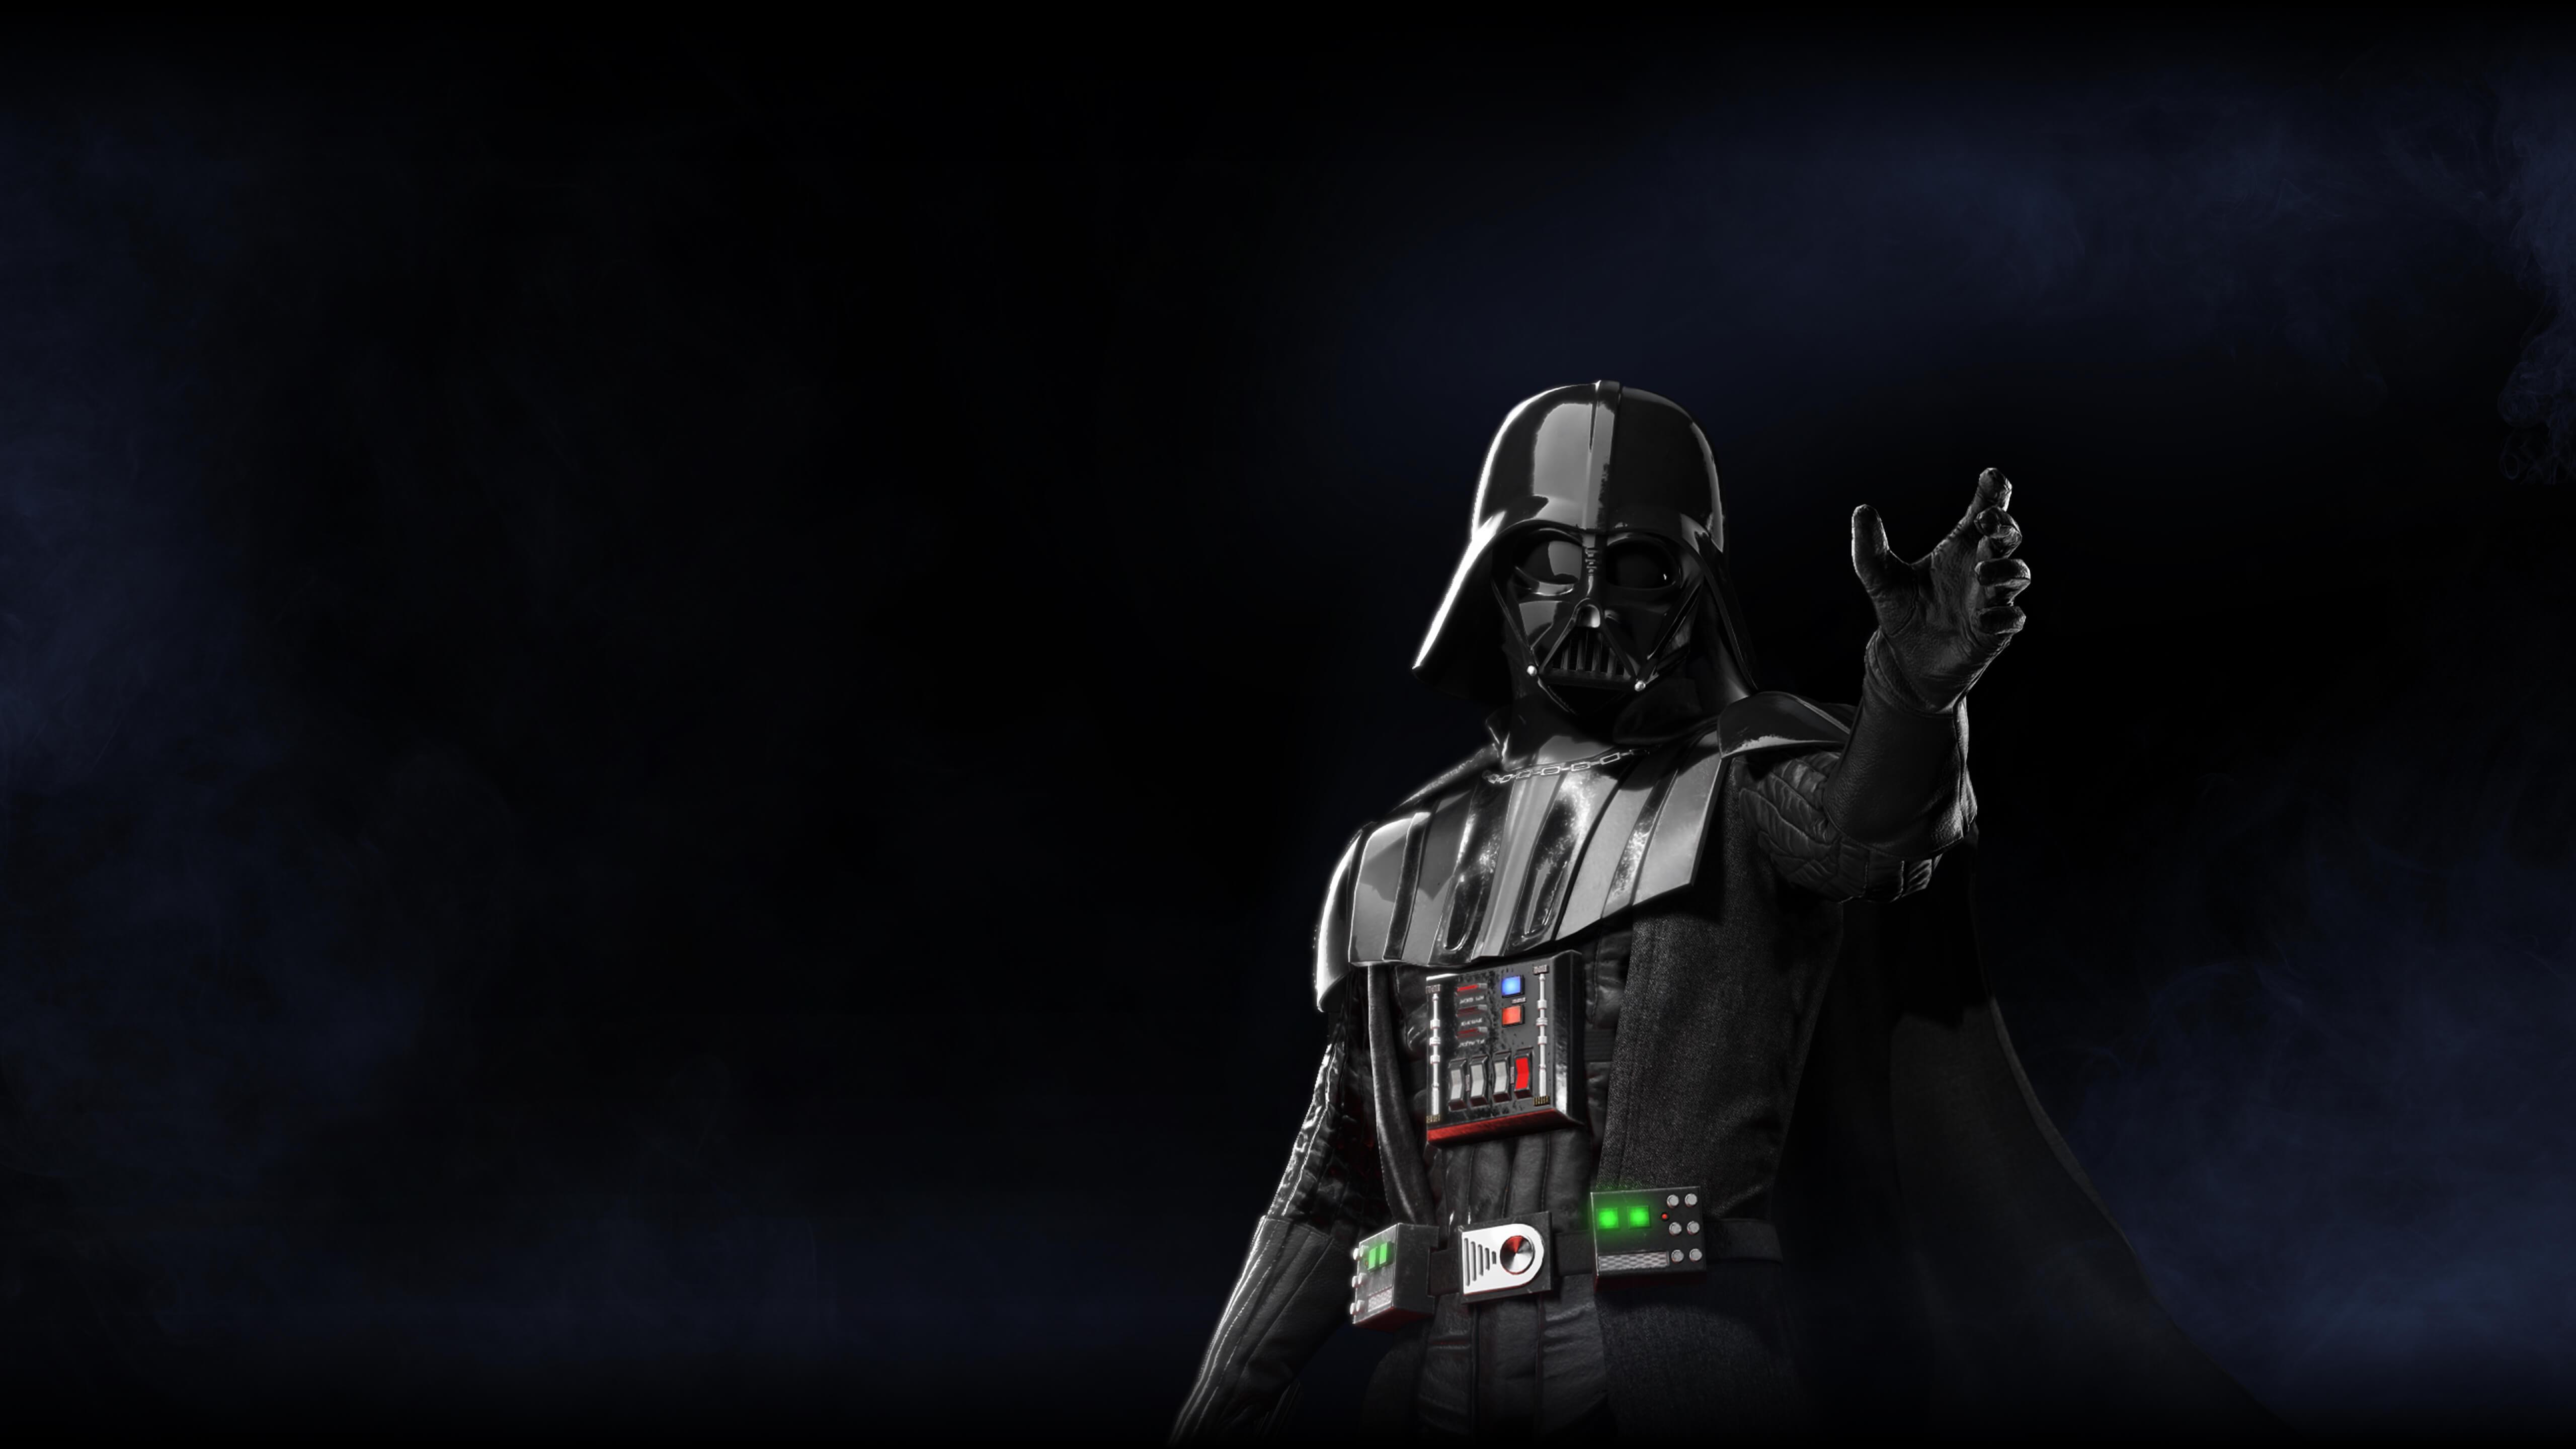 Star Wars 5k Wallpapers Top Free Star Wars 5k Backgrounds